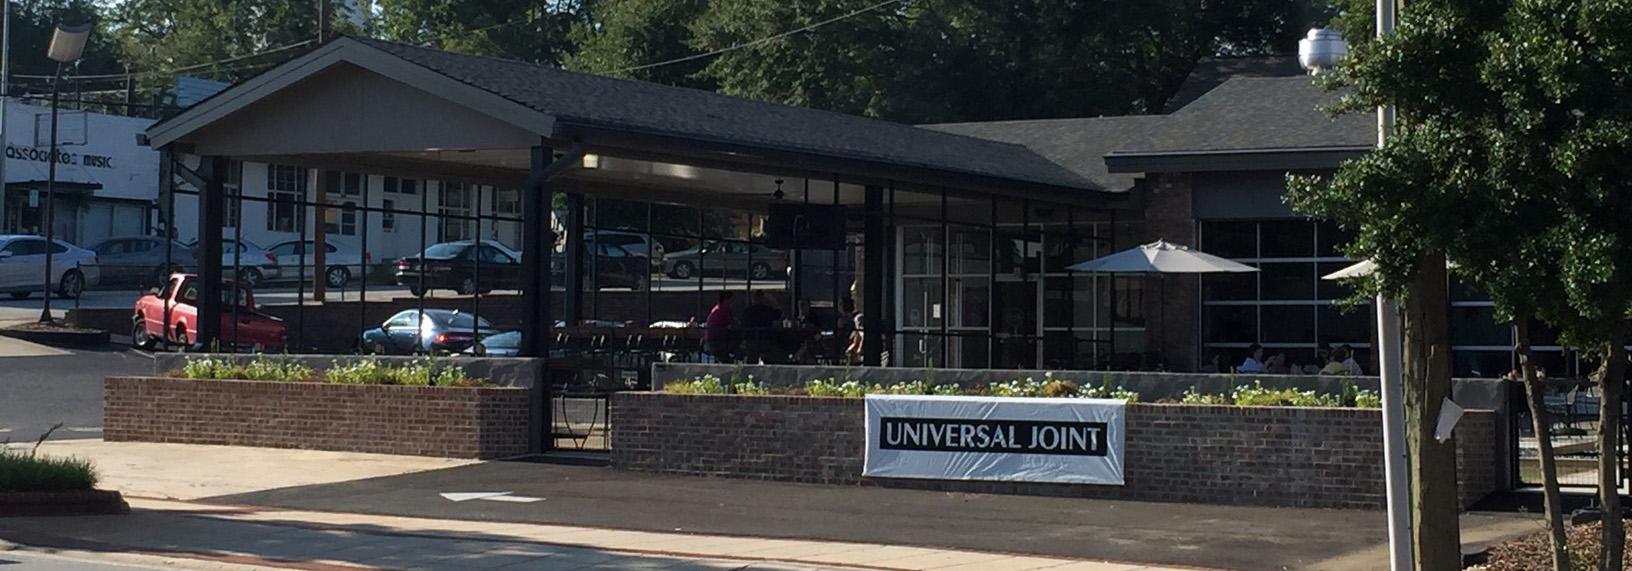 Review Universal Joint Lawrenceville Gwinnett Atlanta Food